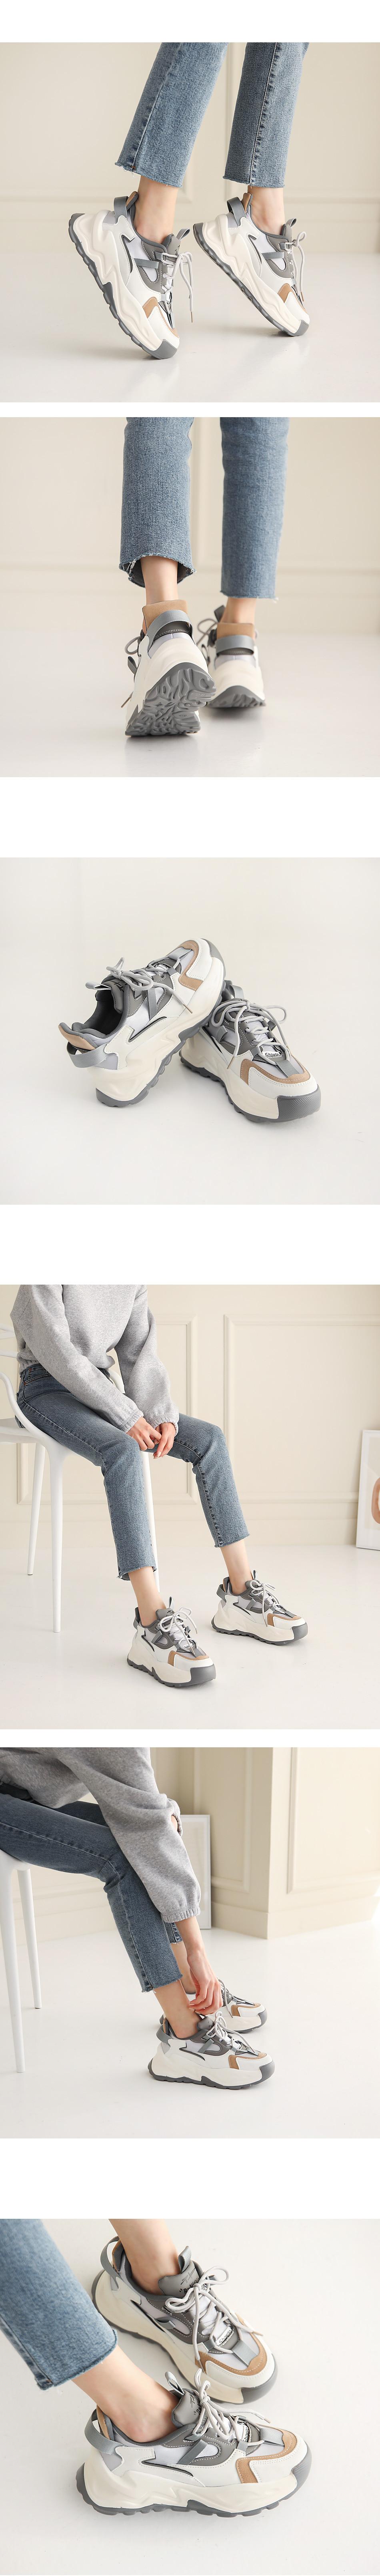 Enough Ugly sneakers 5cm